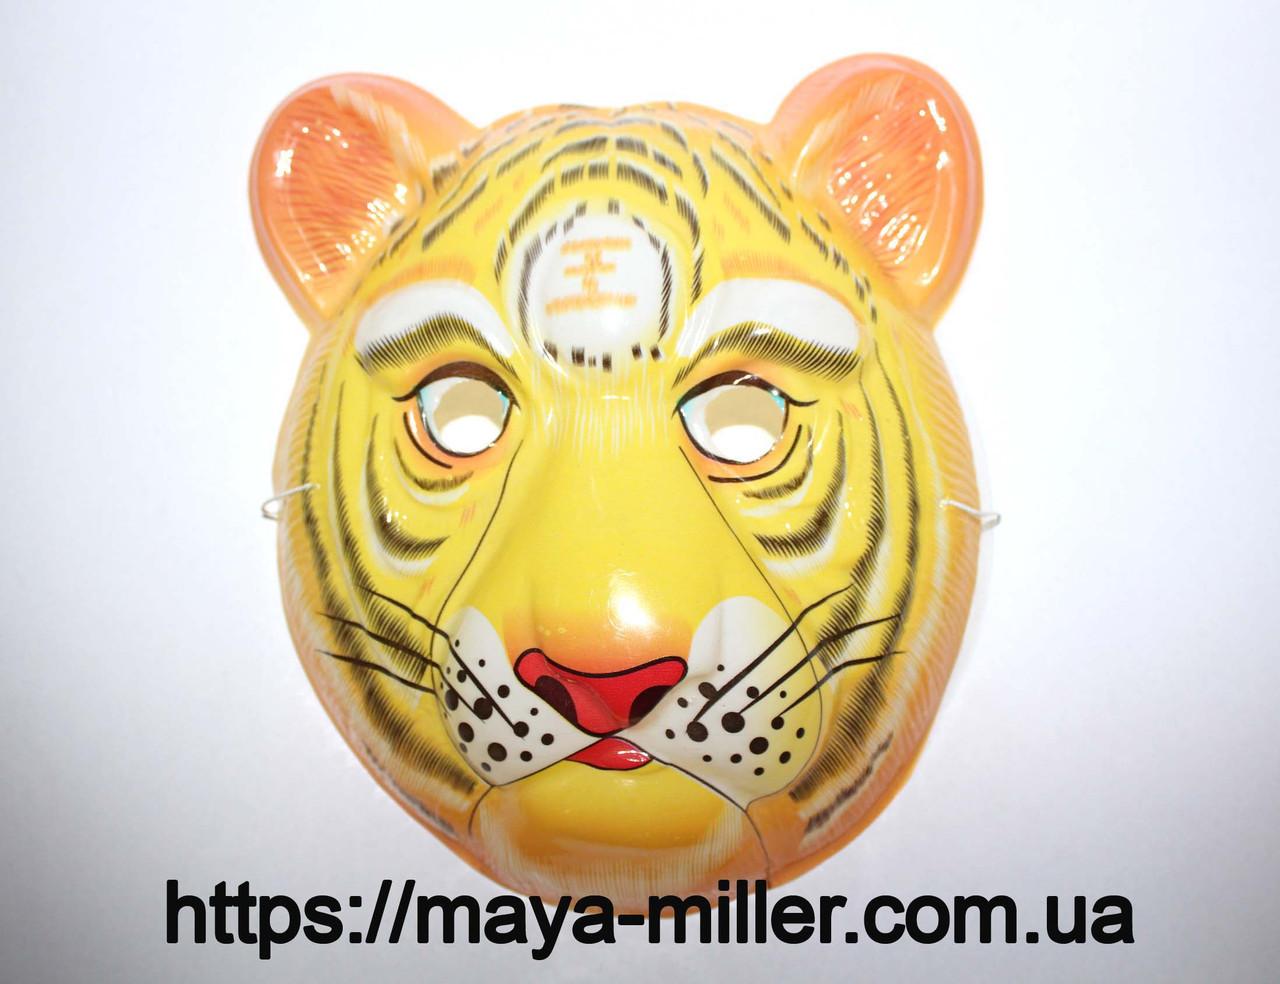 Маска Тигр детская  (тонкий пластик)       Майя Миллер